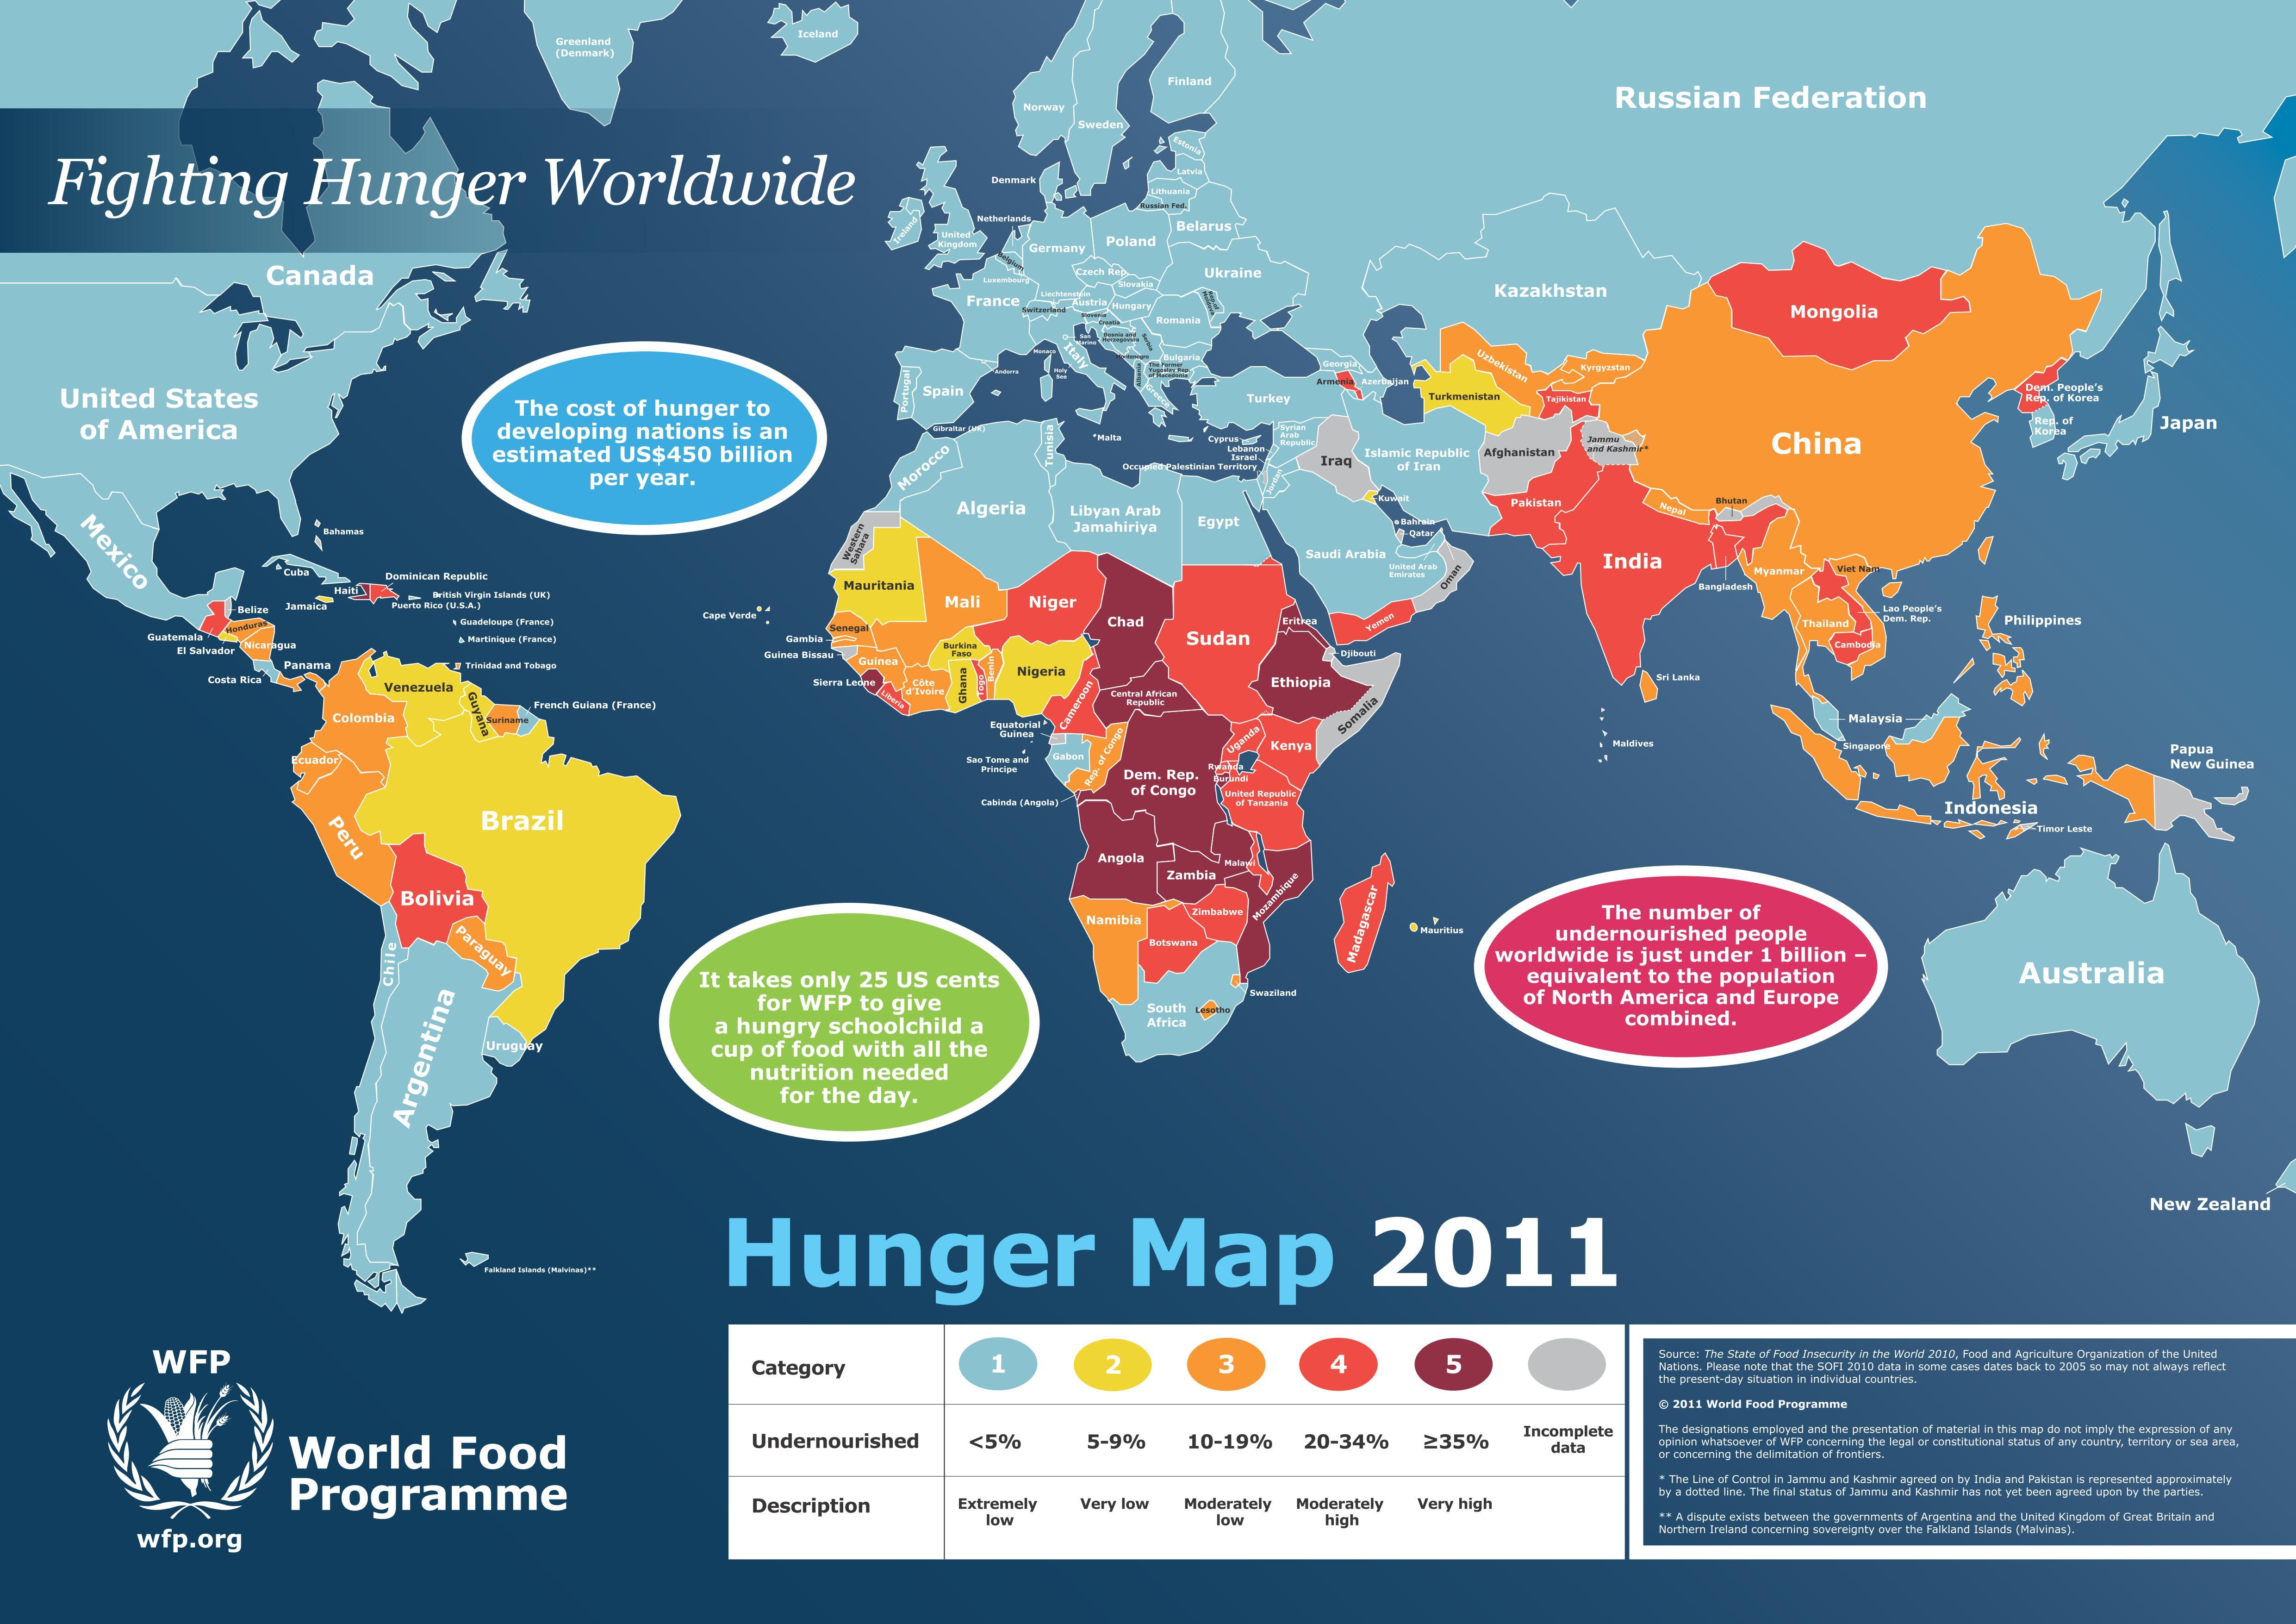 Food deficiencies are especially pronounced in Sub-Saharan Africa.